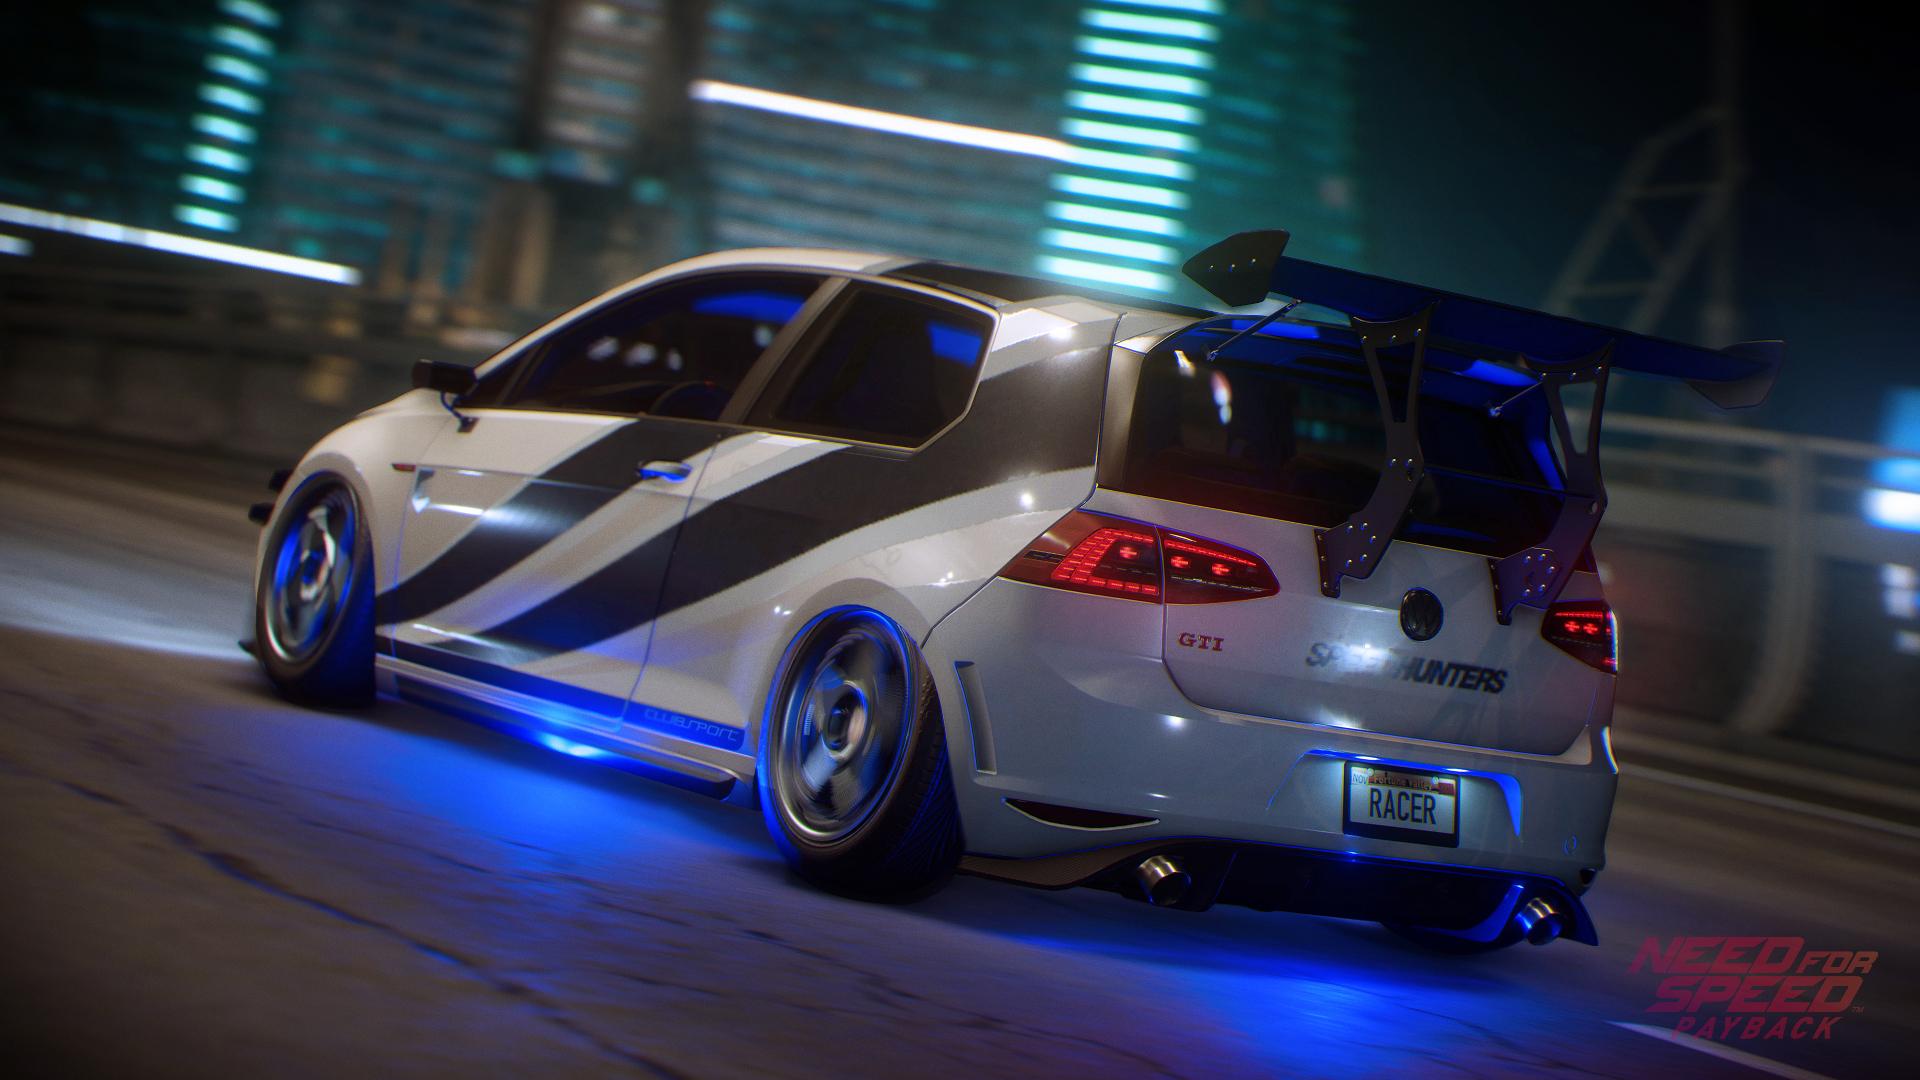 Опубликованы оценки Need for Speed Payback — неплохо